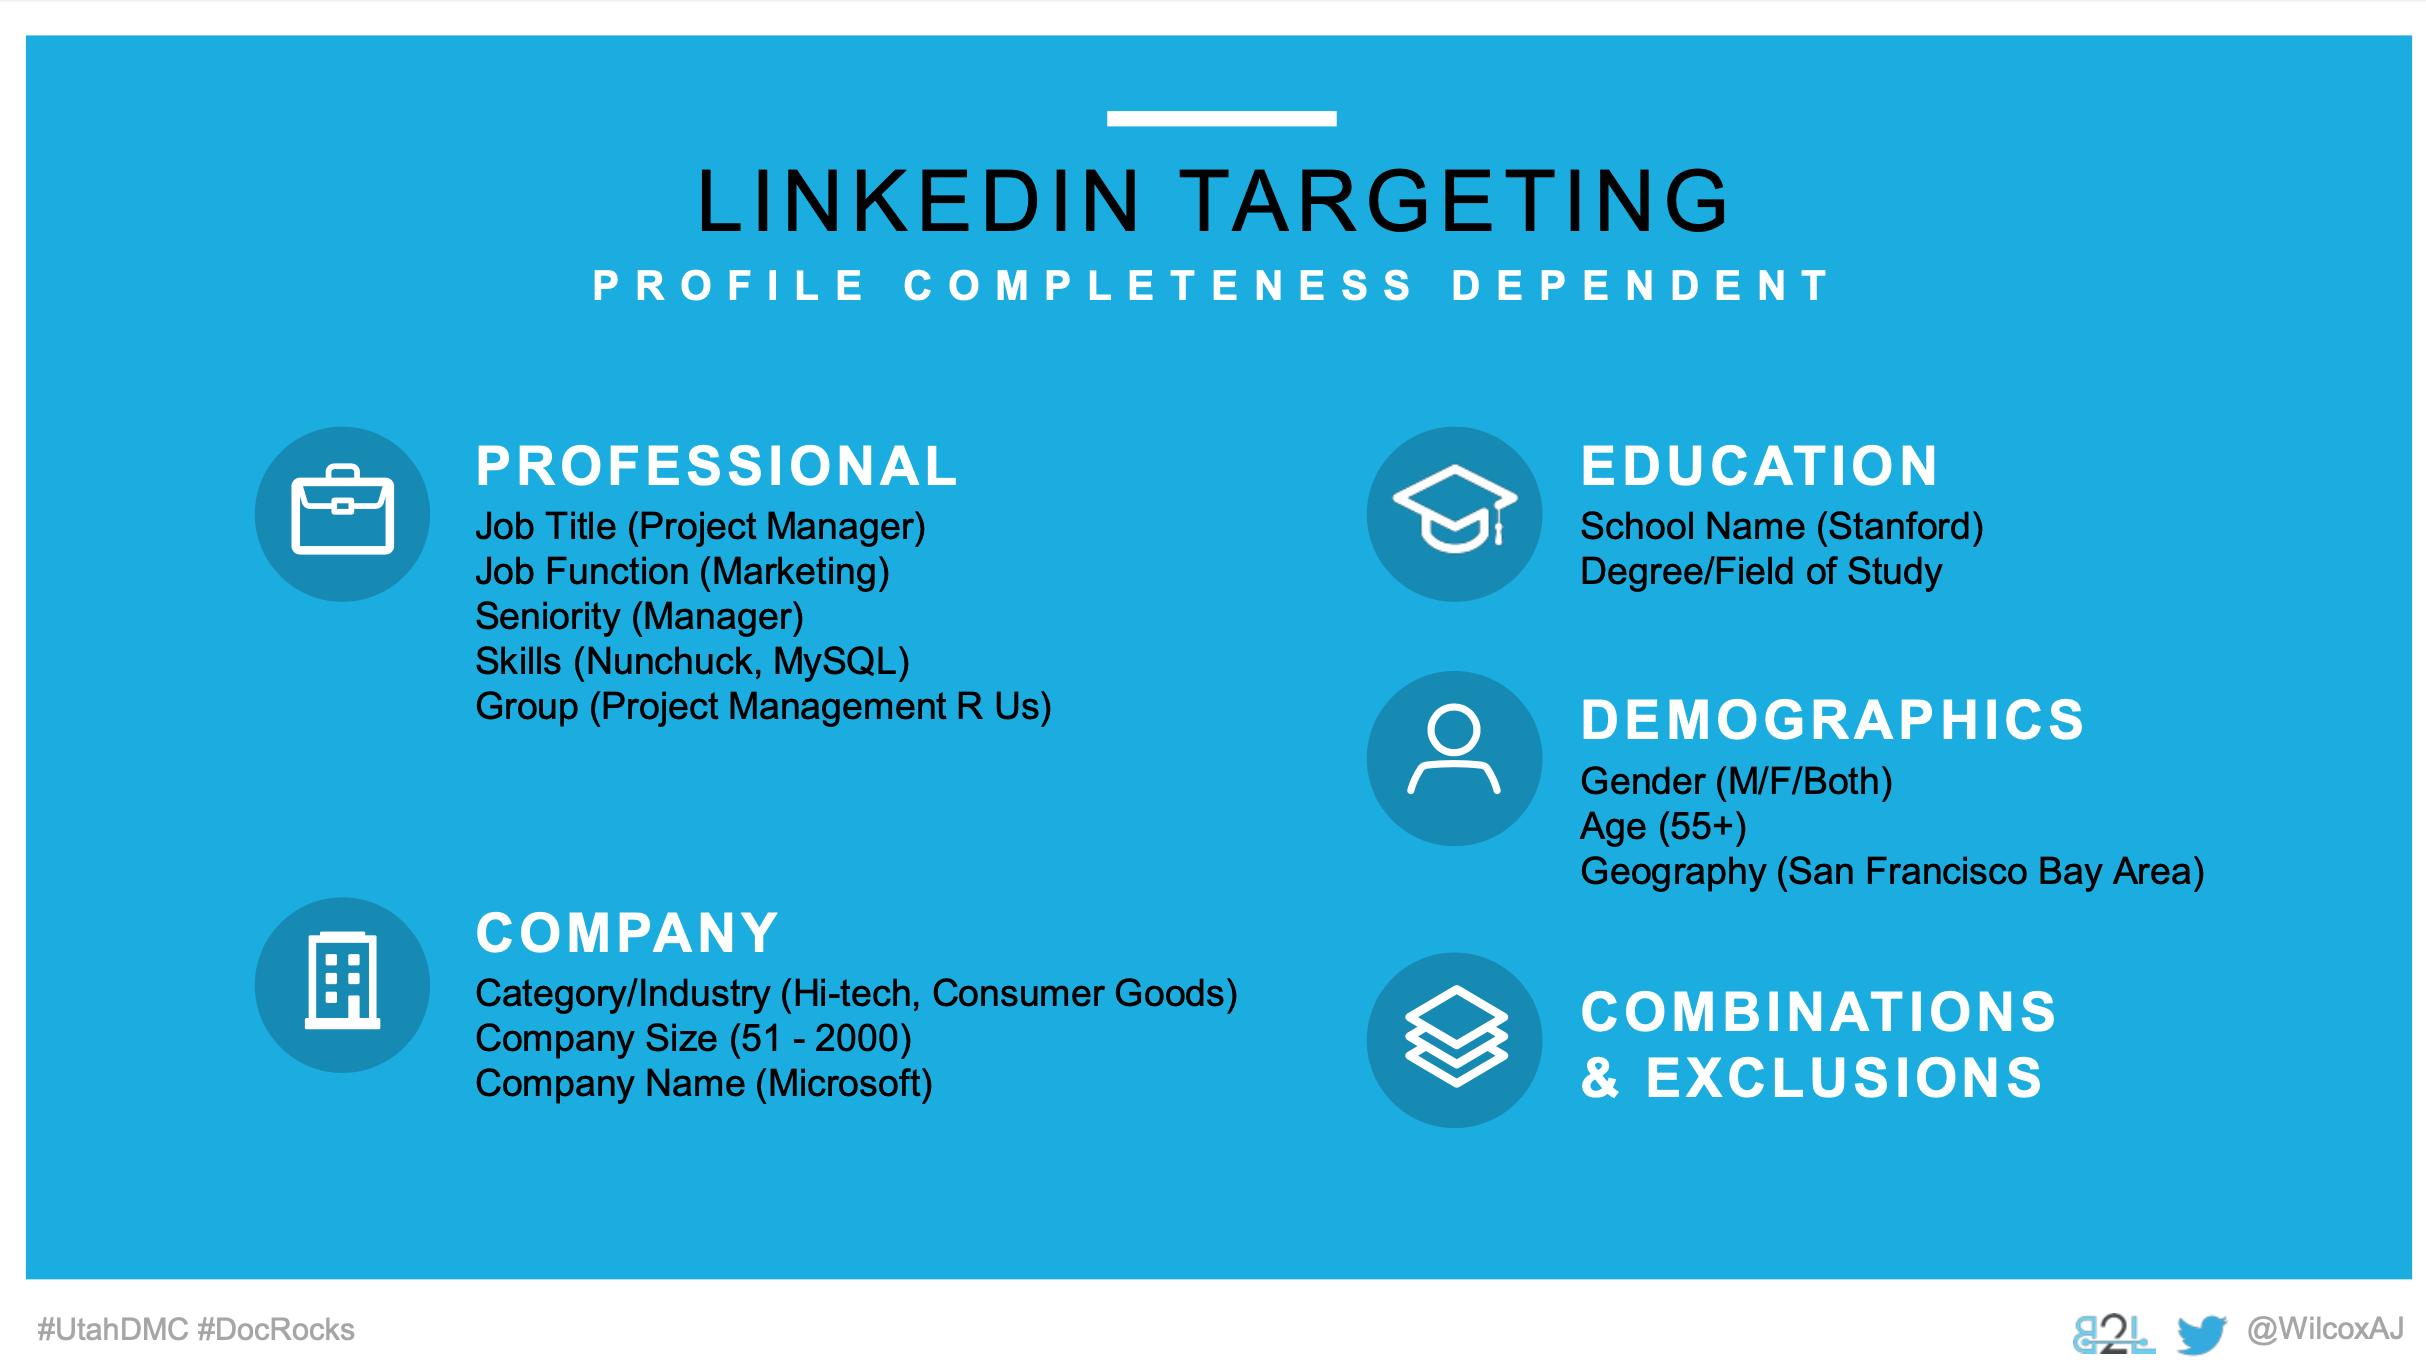 Utah DMC LinkedIn Ads - Aj Wilcox - Ad Units - LinkedIn Targeting